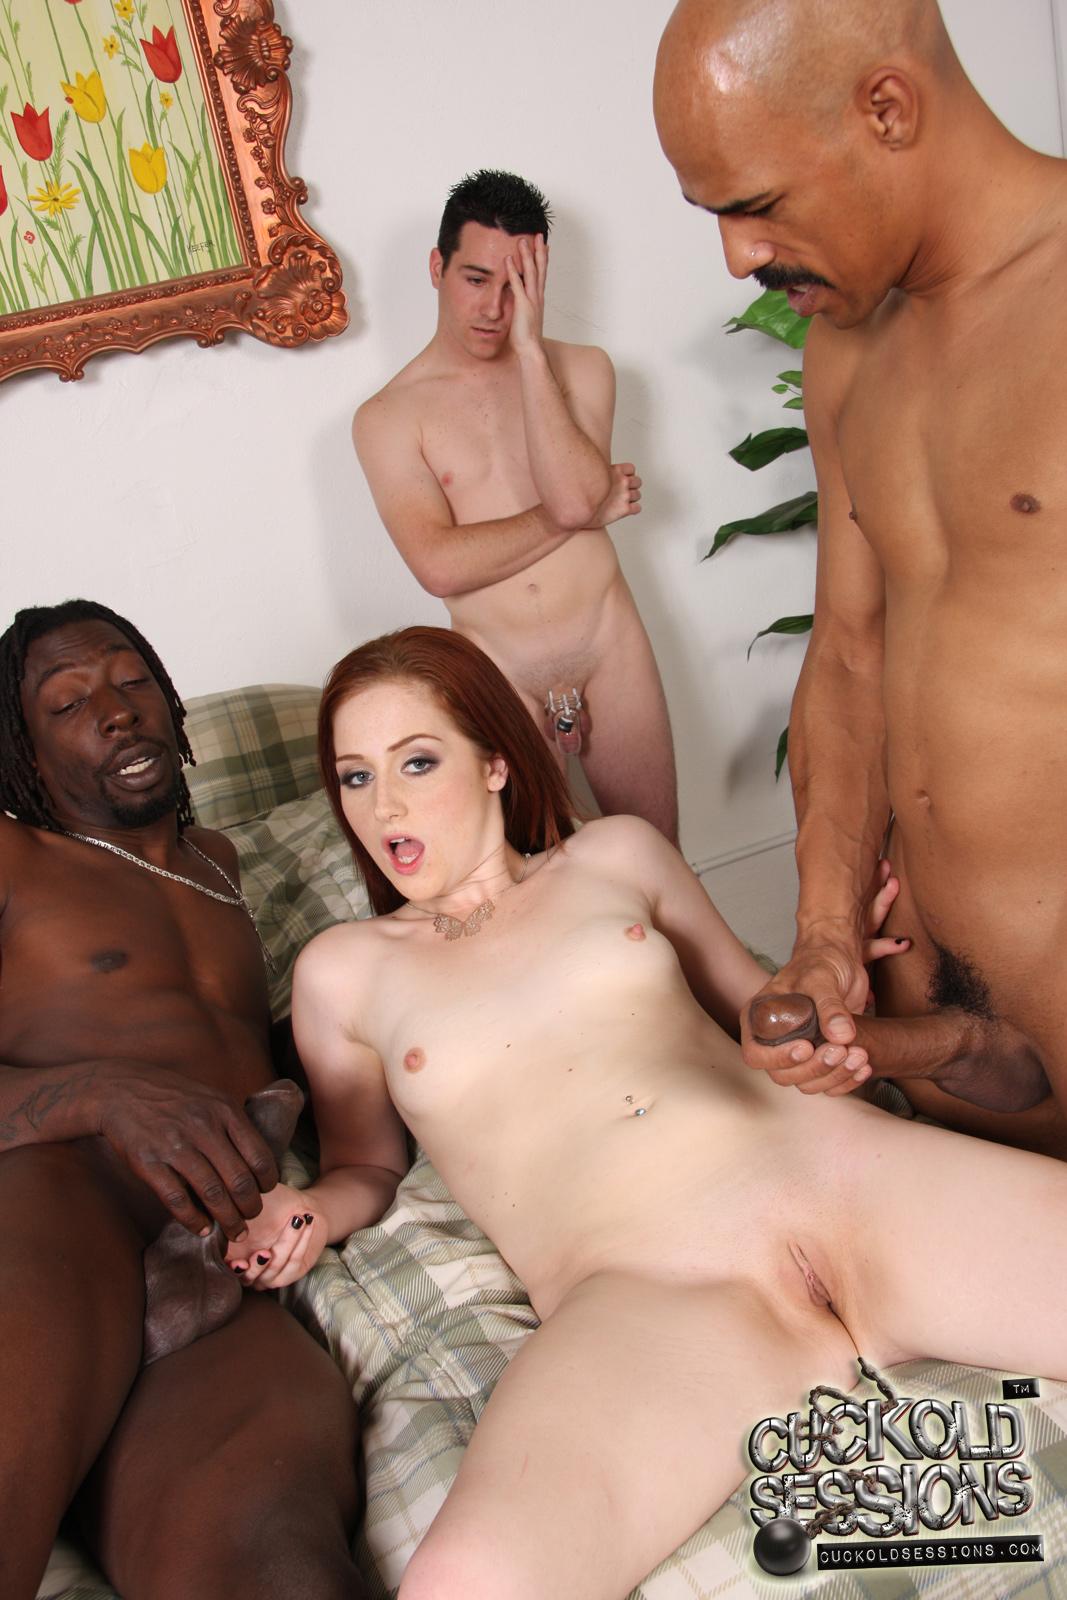 Free Porn Samples Of Cuckold Sessions - Best Big Black -8390